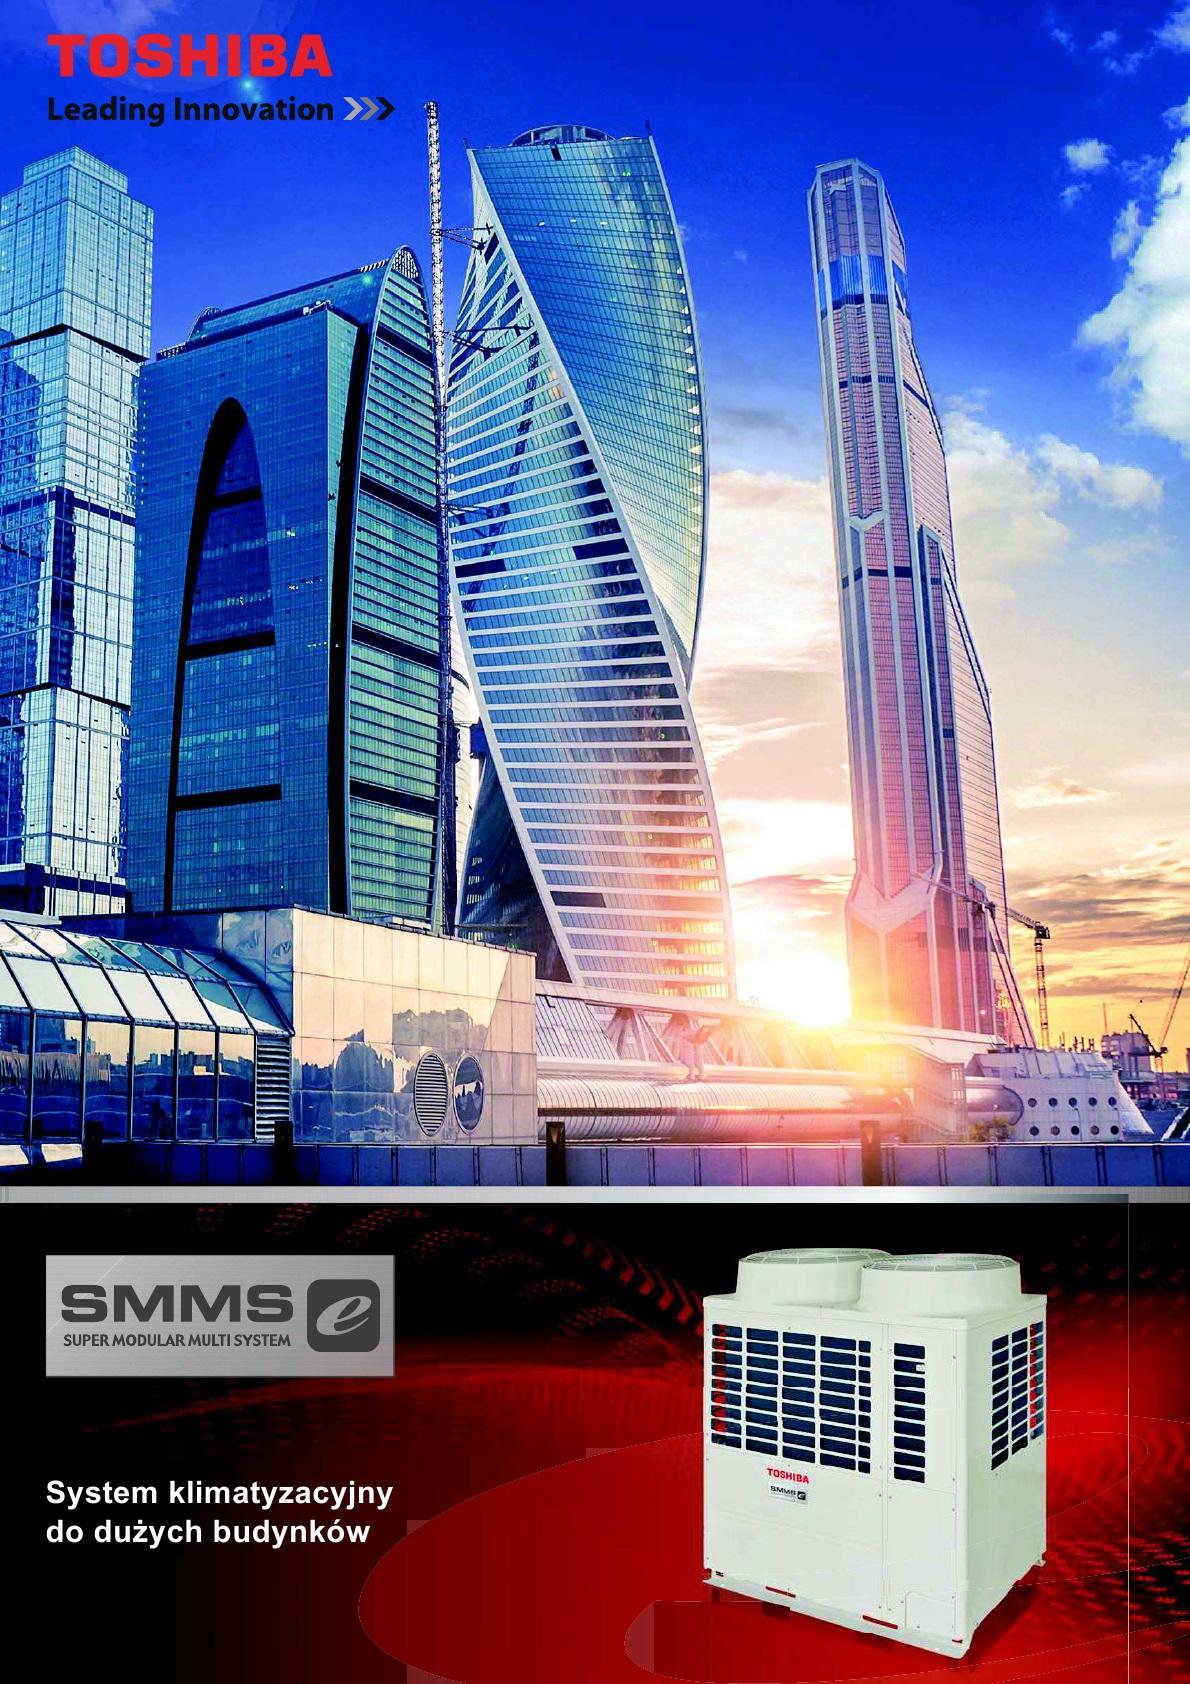 Katalog SMMSe 2016